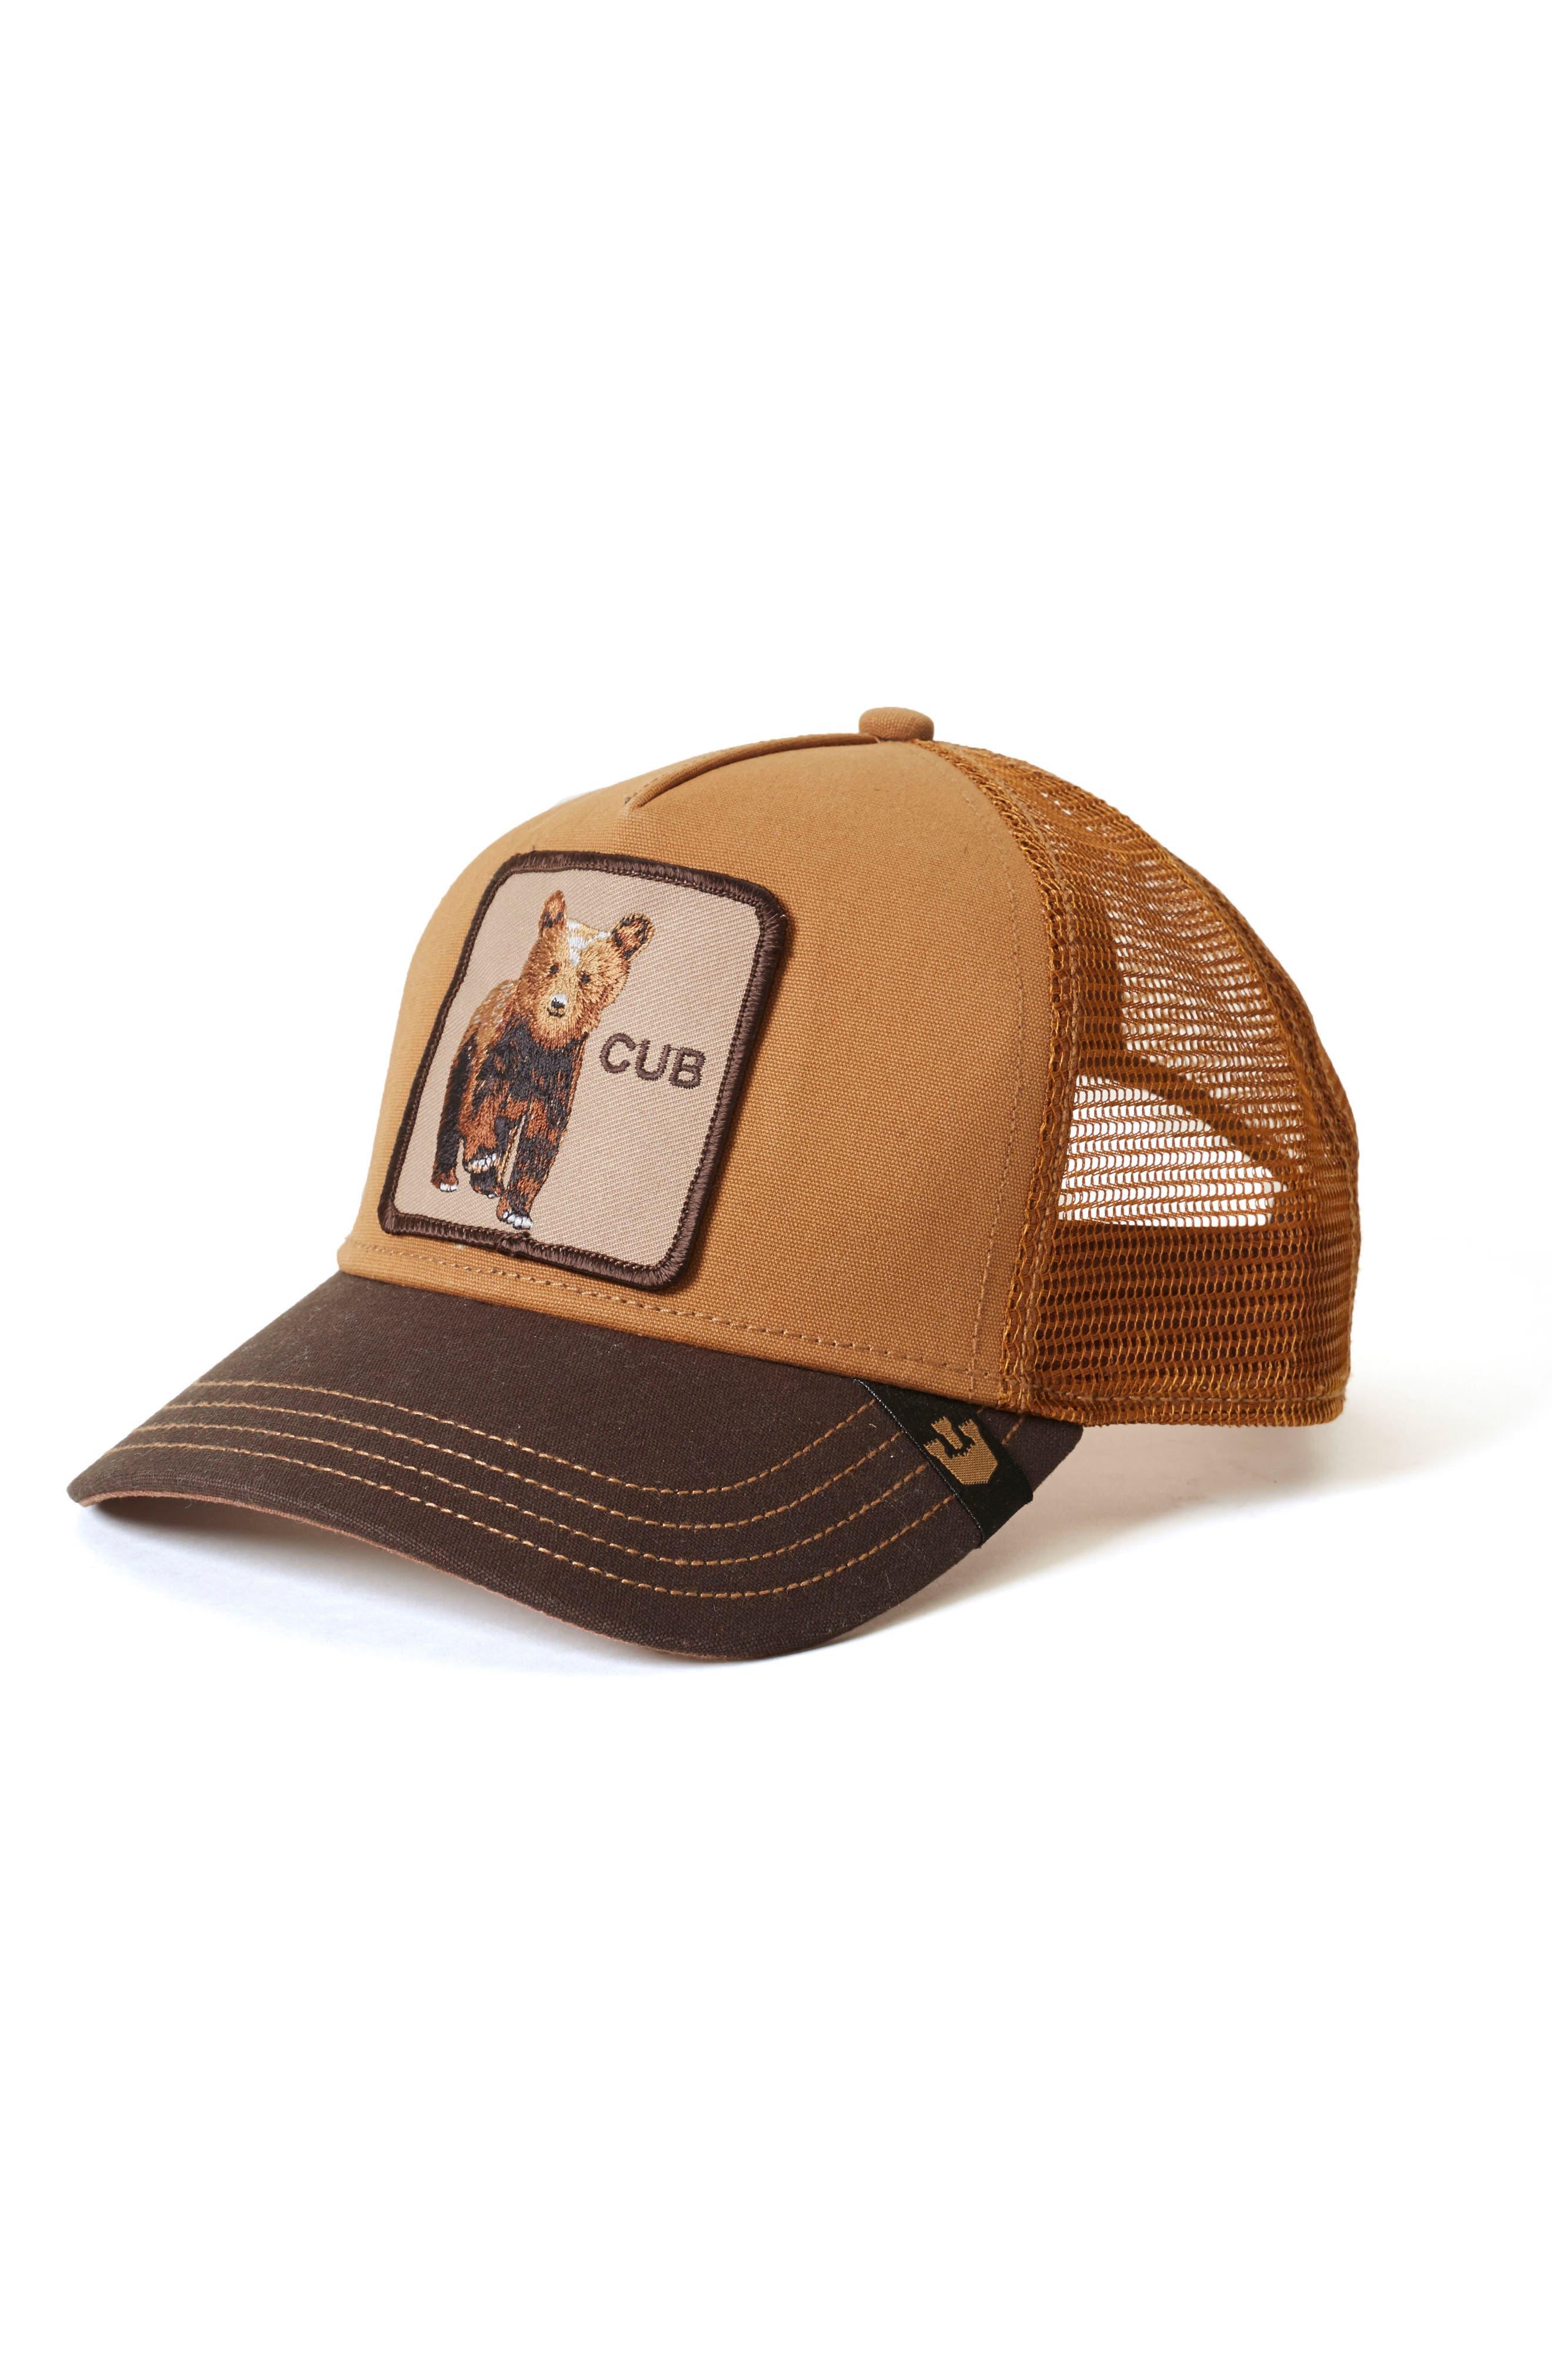 Cub Trucker Hat,                             Main thumbnail 1, color,